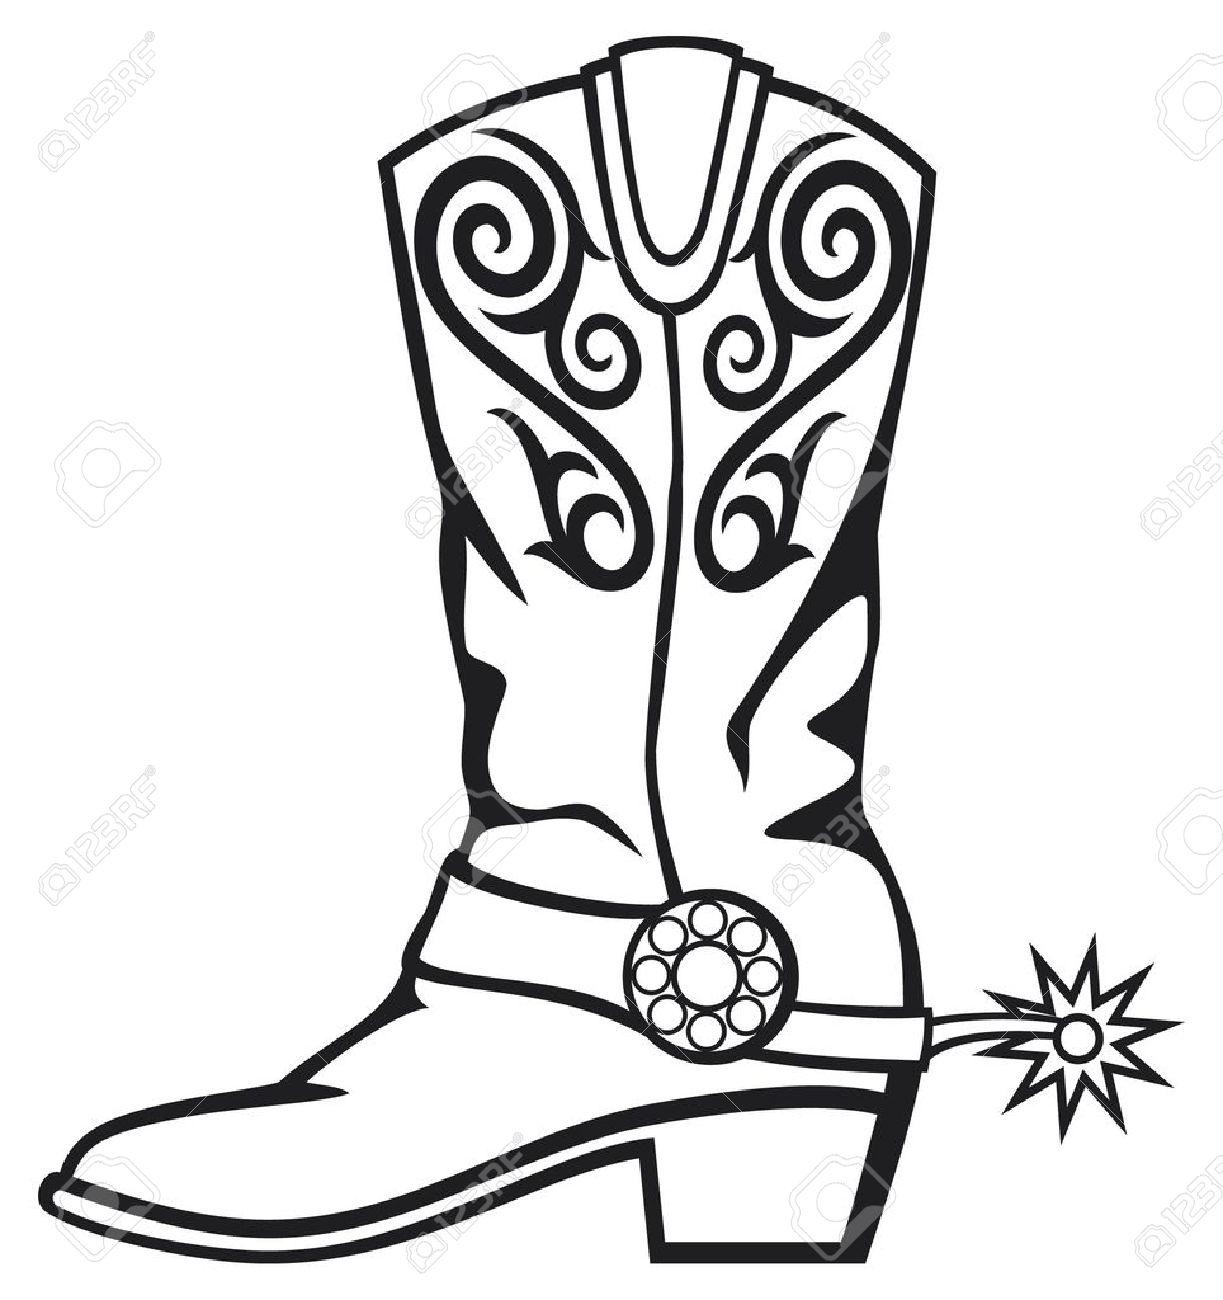 Clipart Cowgirl Boots - .-Clipart cowgirl boots - .-7